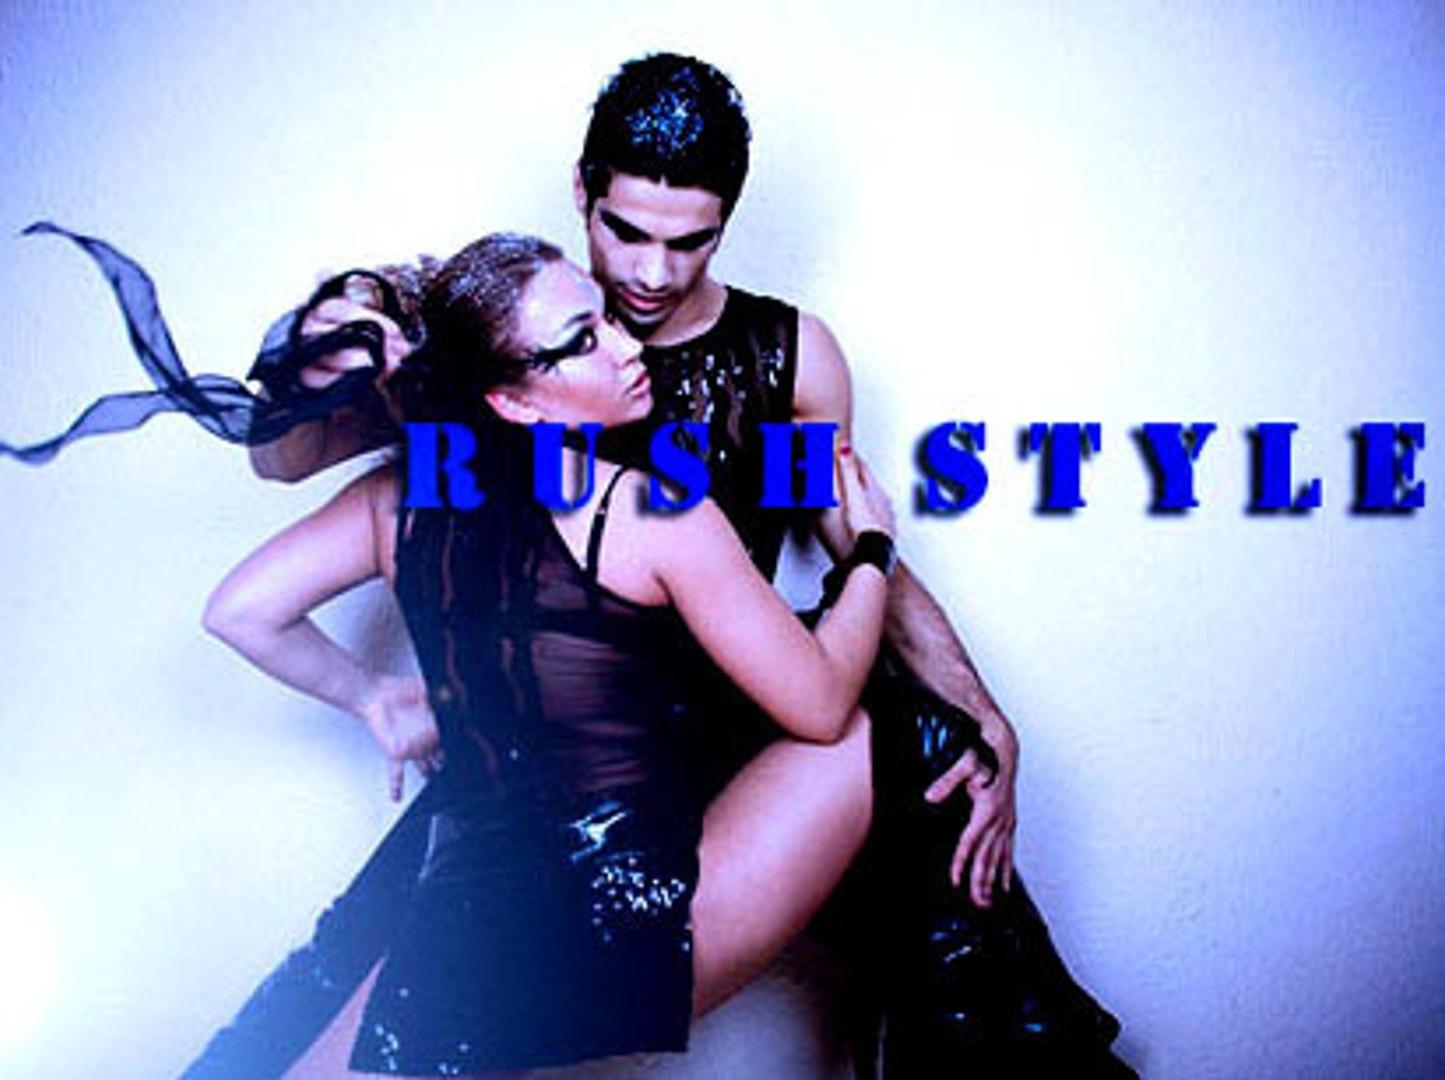 Rush Style (promo 2010)